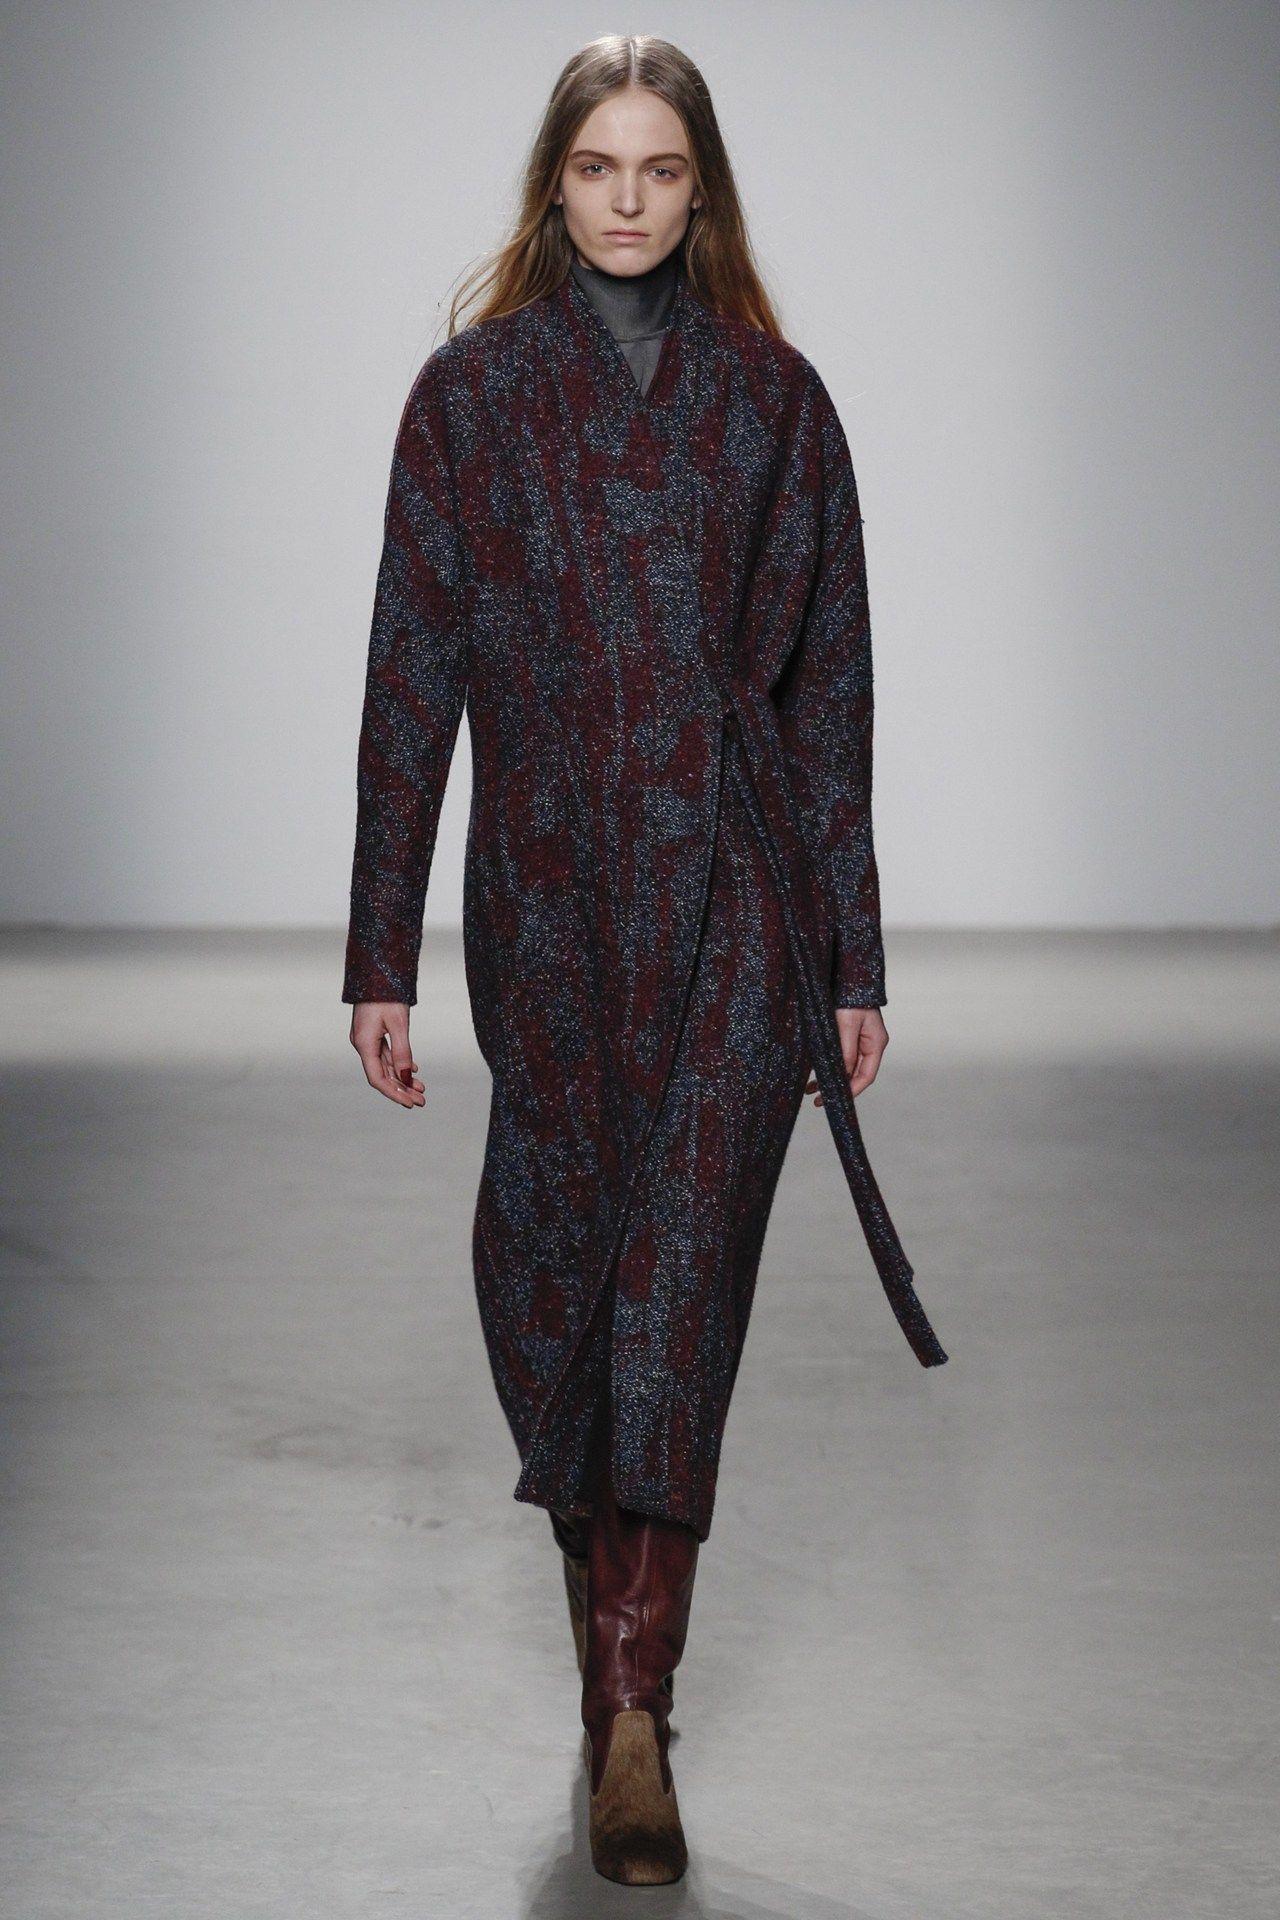 Damir Doma fashion collection, autumn/winter 2014